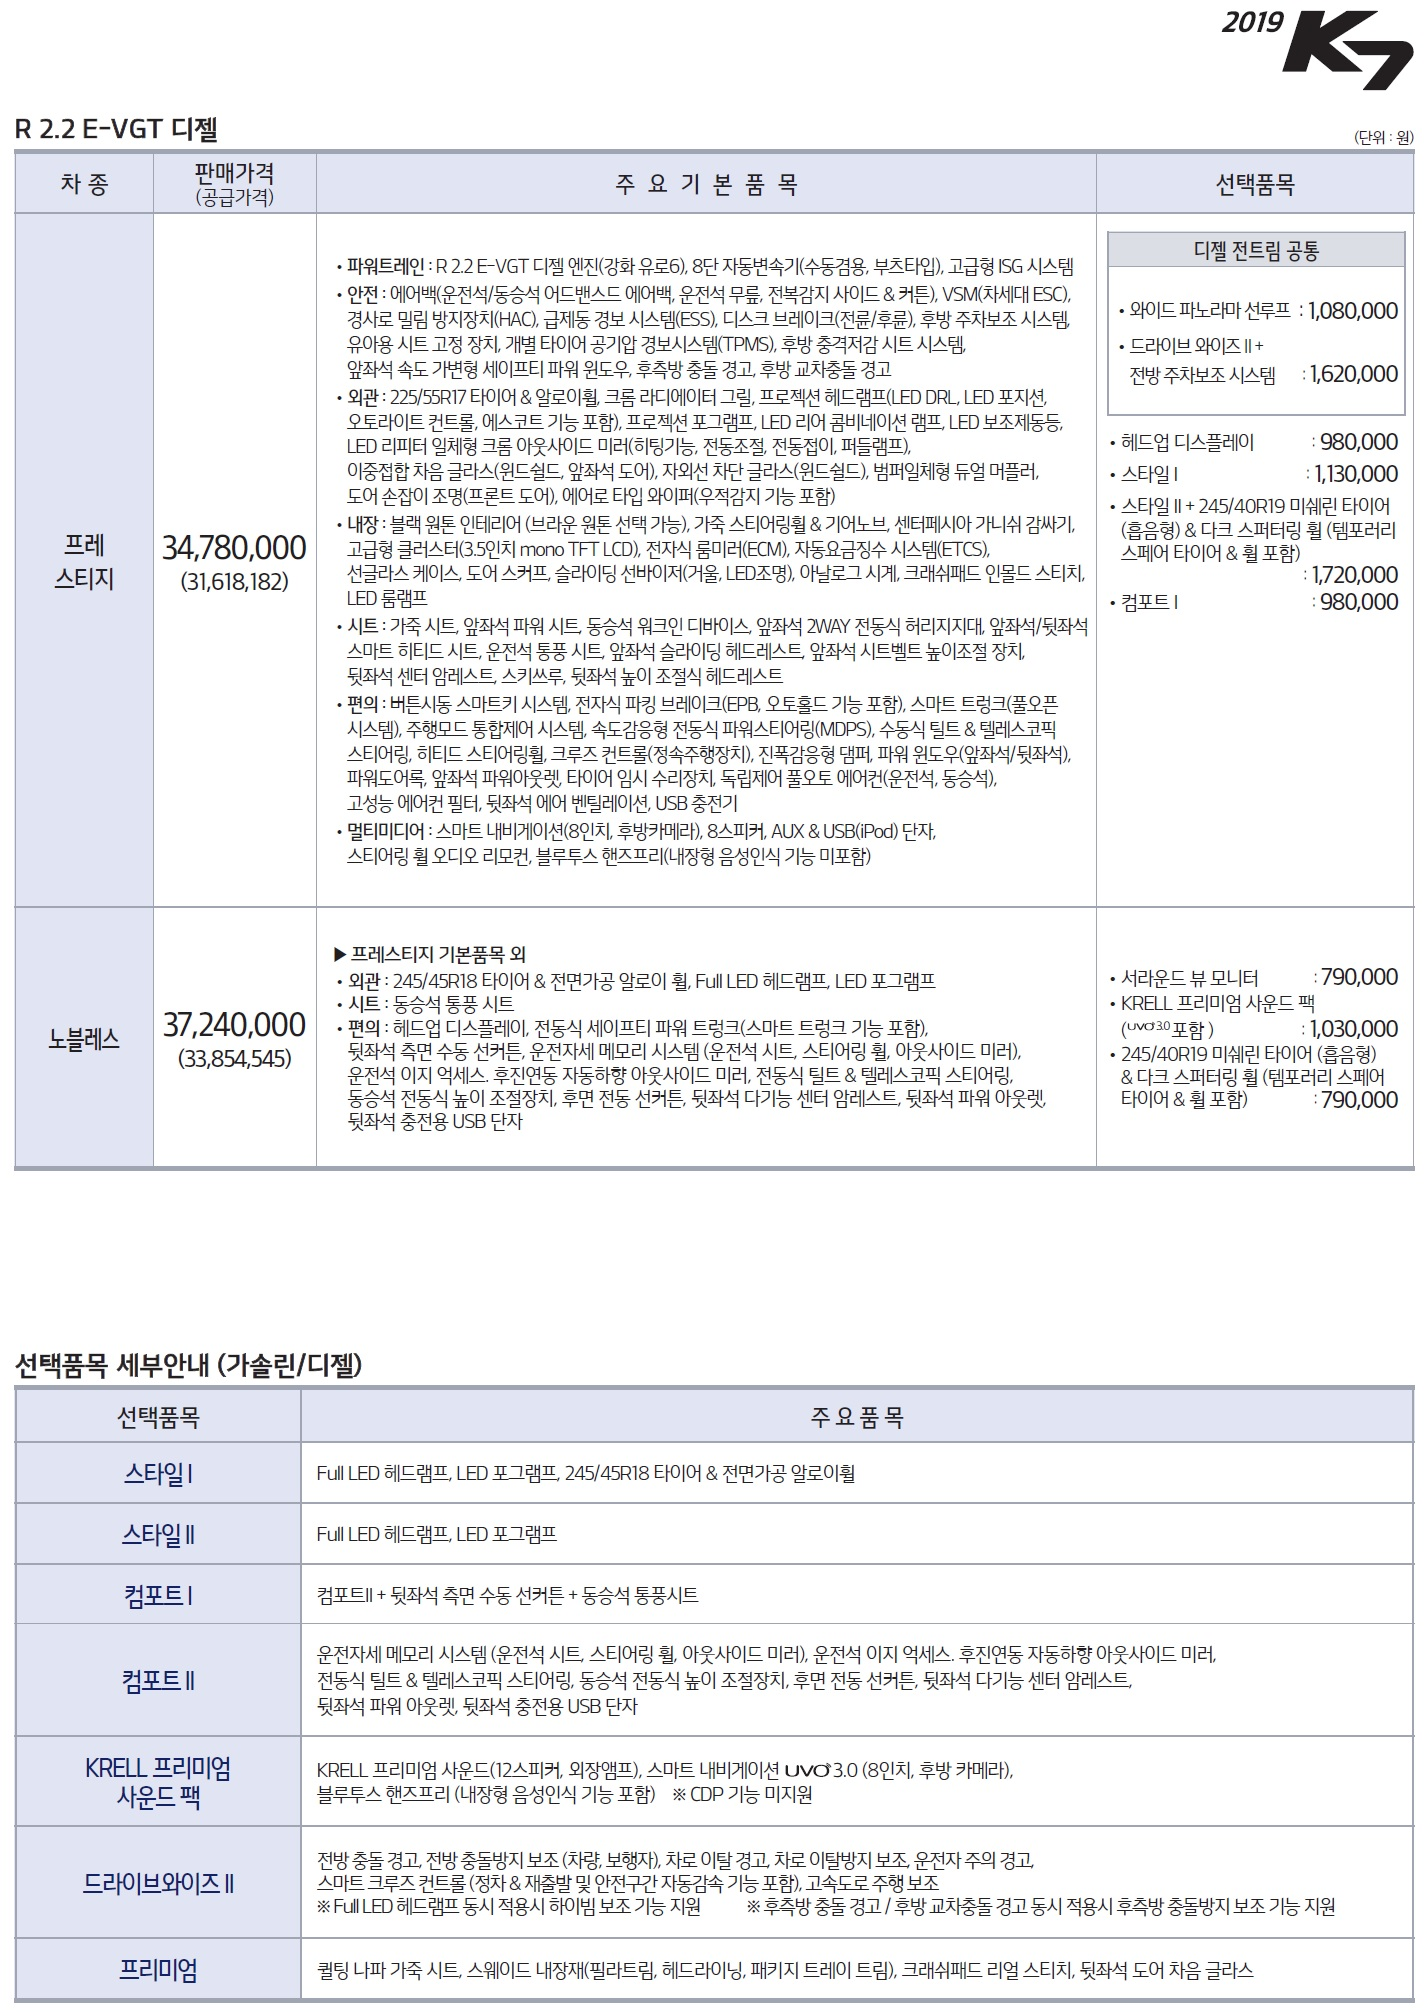 k7 가격표 - 2019년형 (2018년 12월) -2.jpg